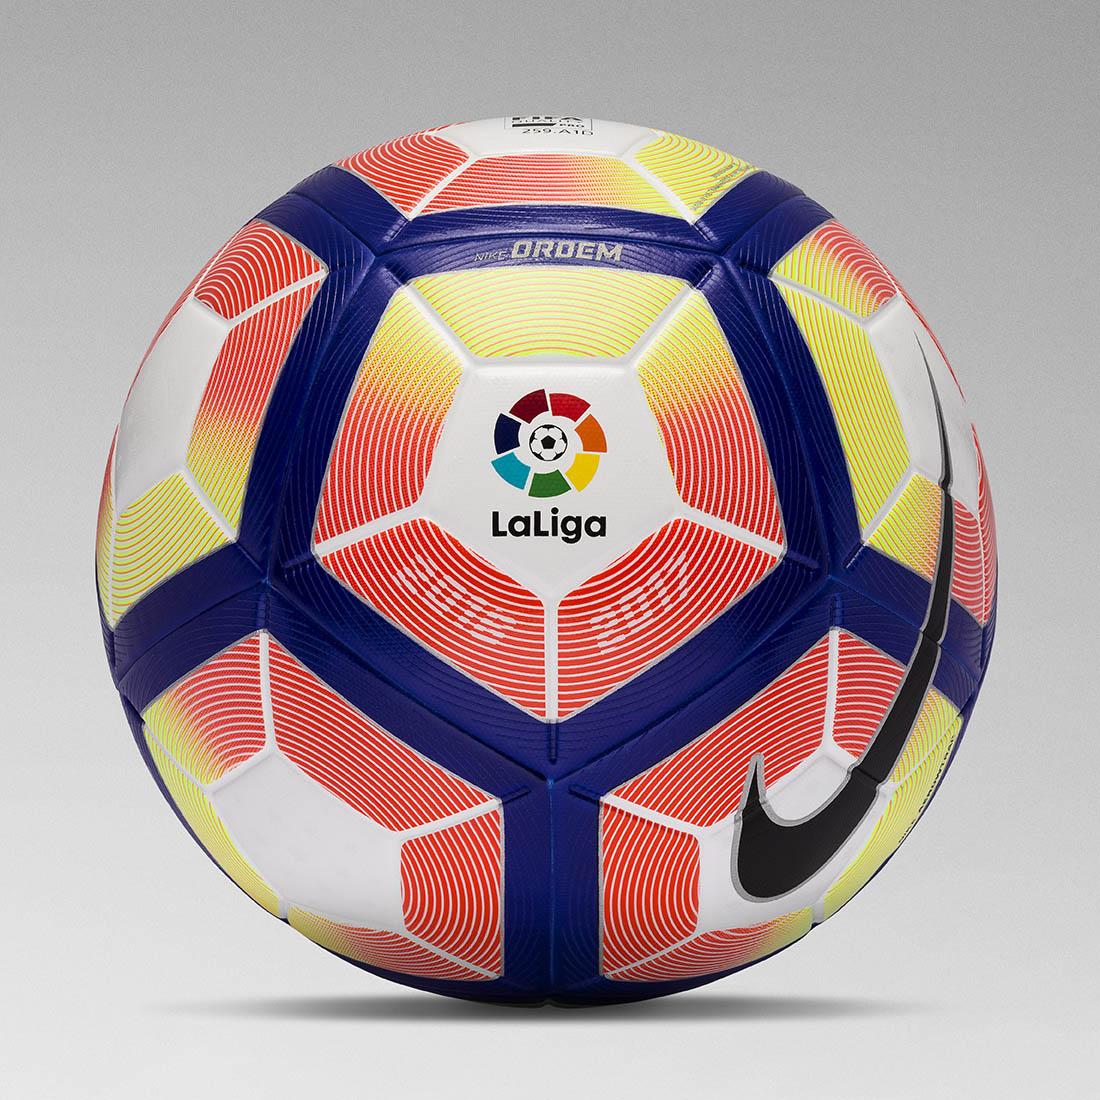 Fútbol Temporada 2016/17